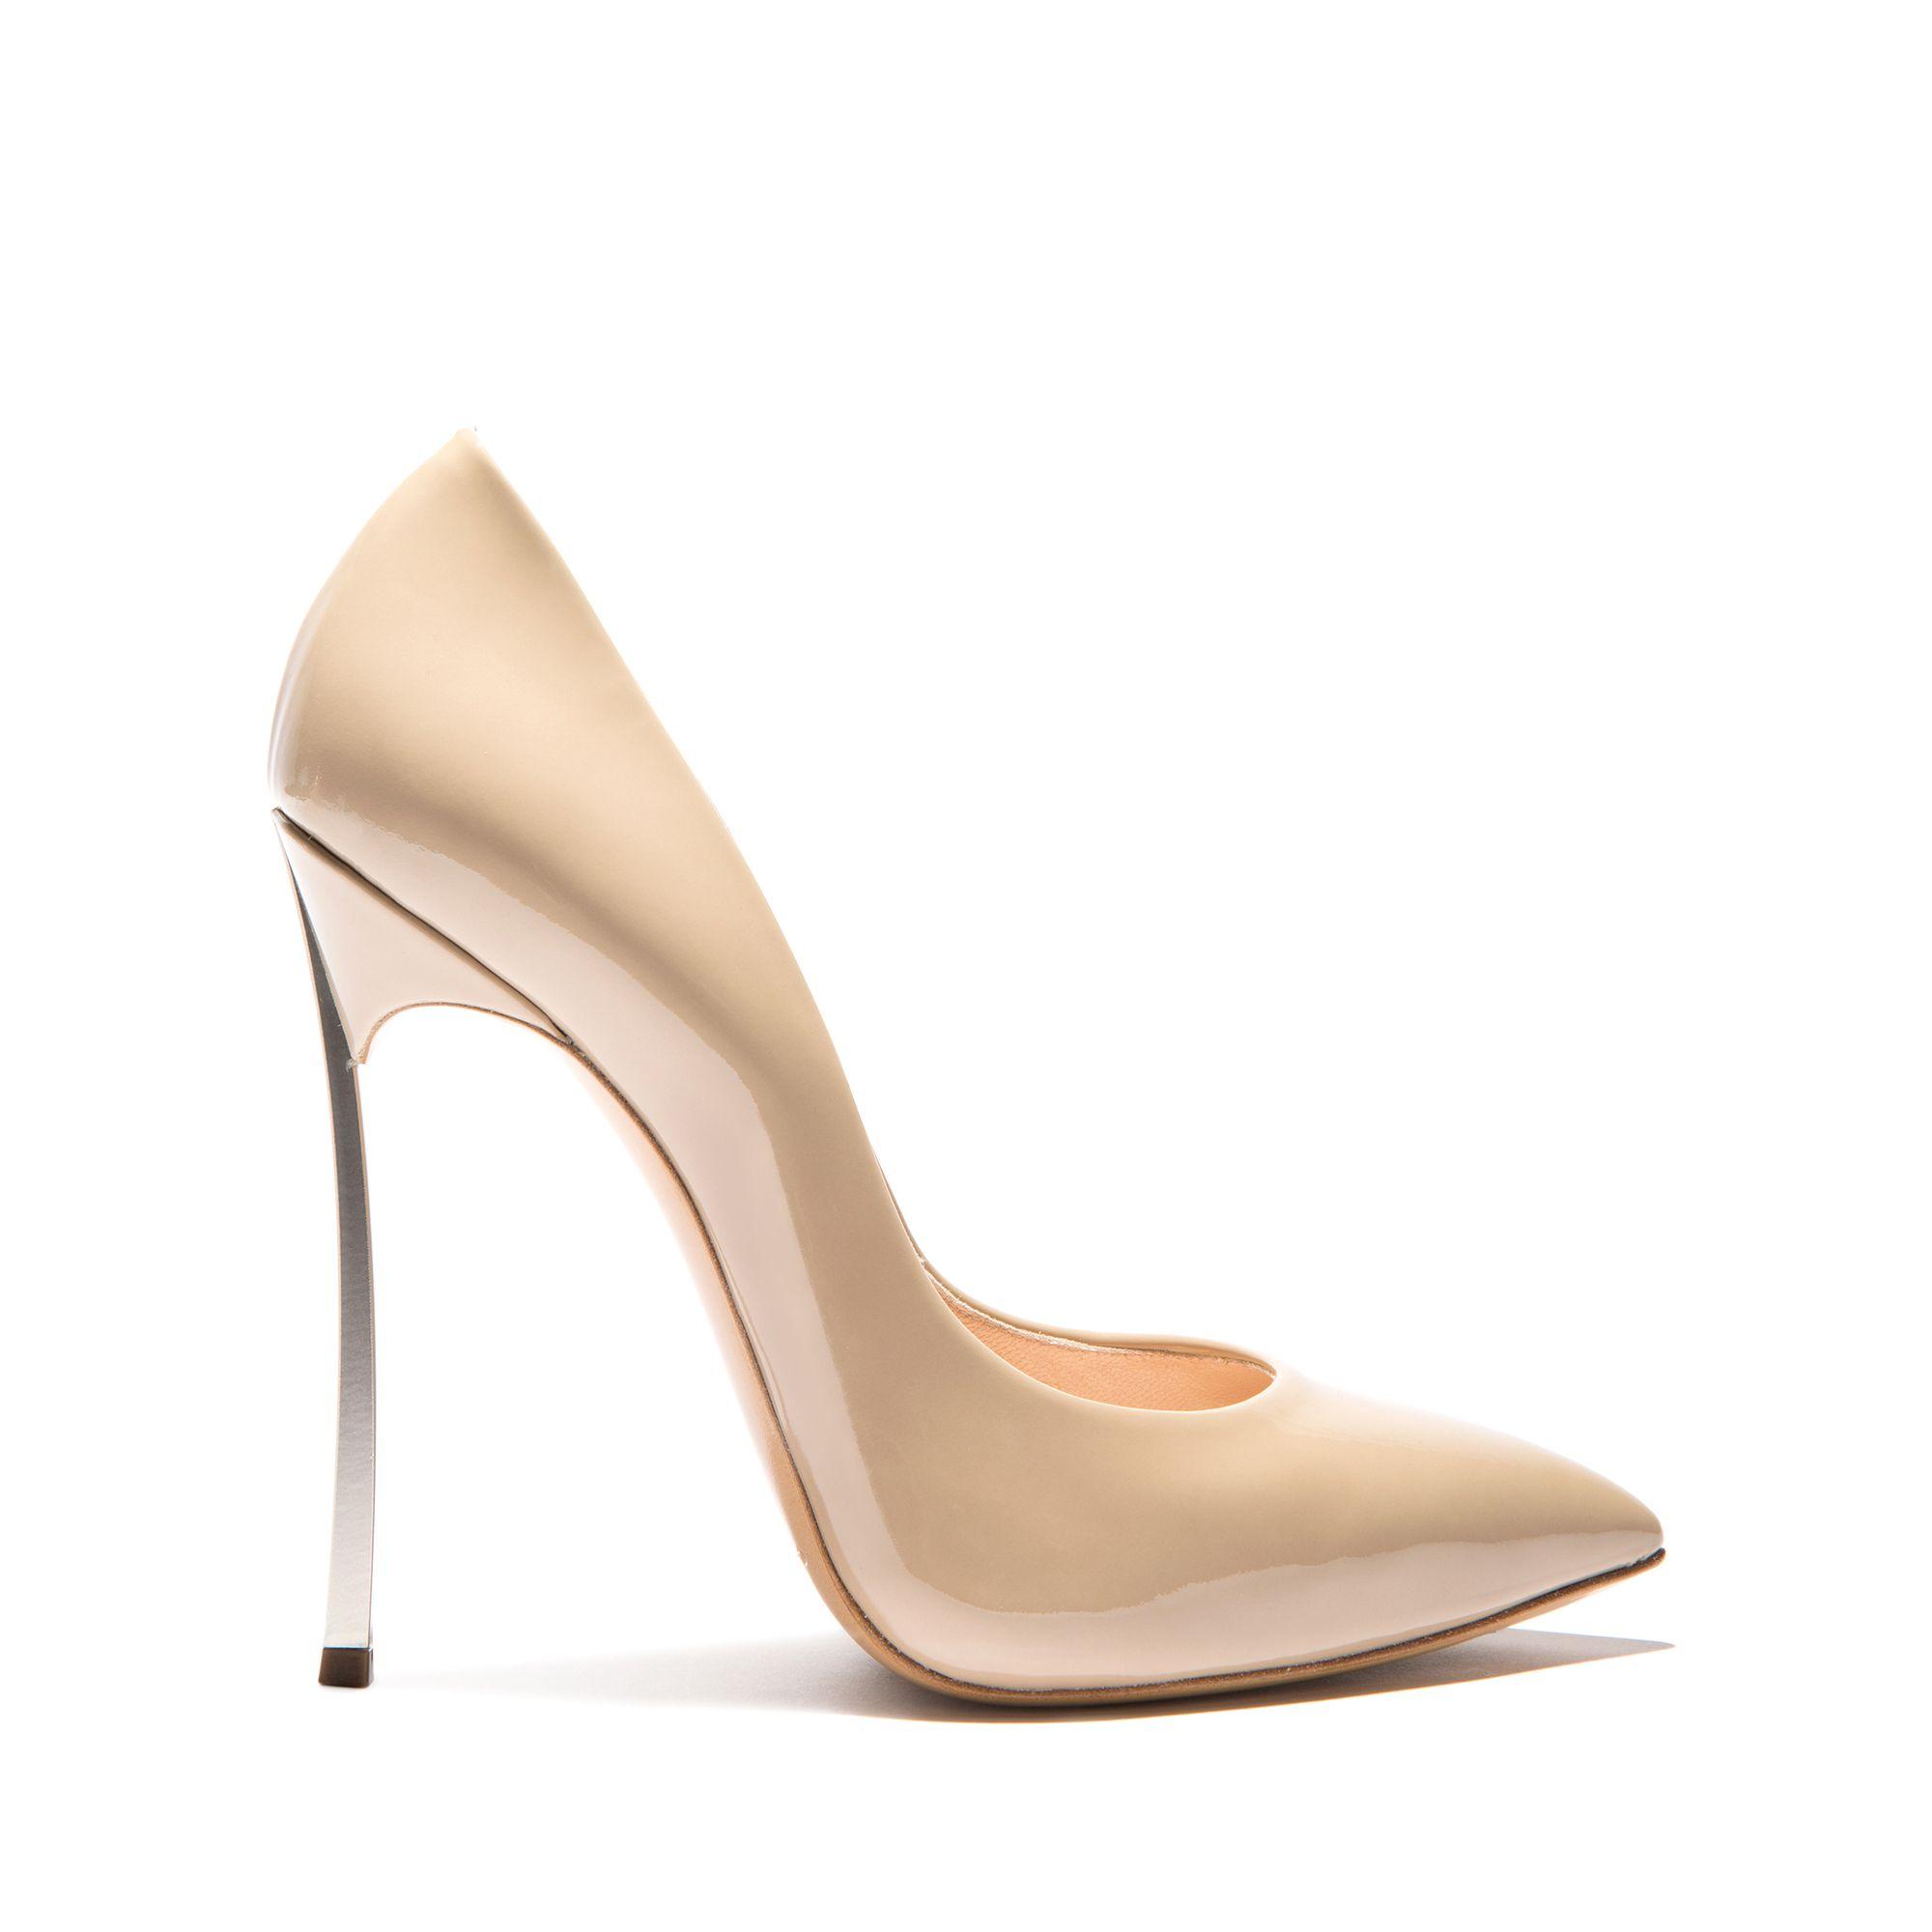 25c168551  Casadei. Discover  Bridal Collection.  Casadei Wedding Shoes Heels